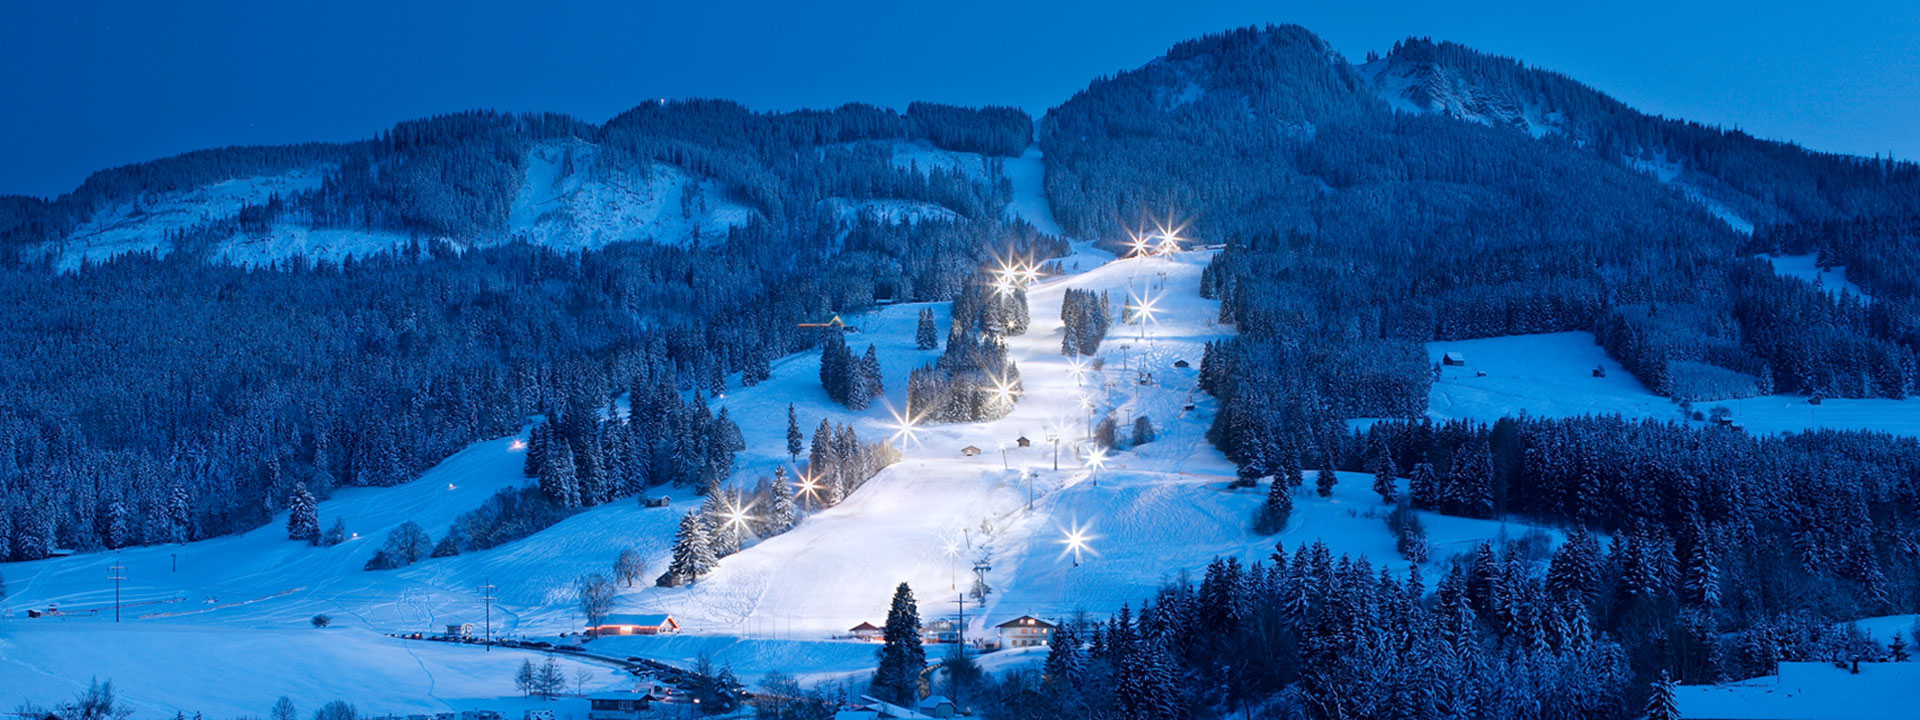 Skigebiet Allgau Alpspitzbahn Nesselwang